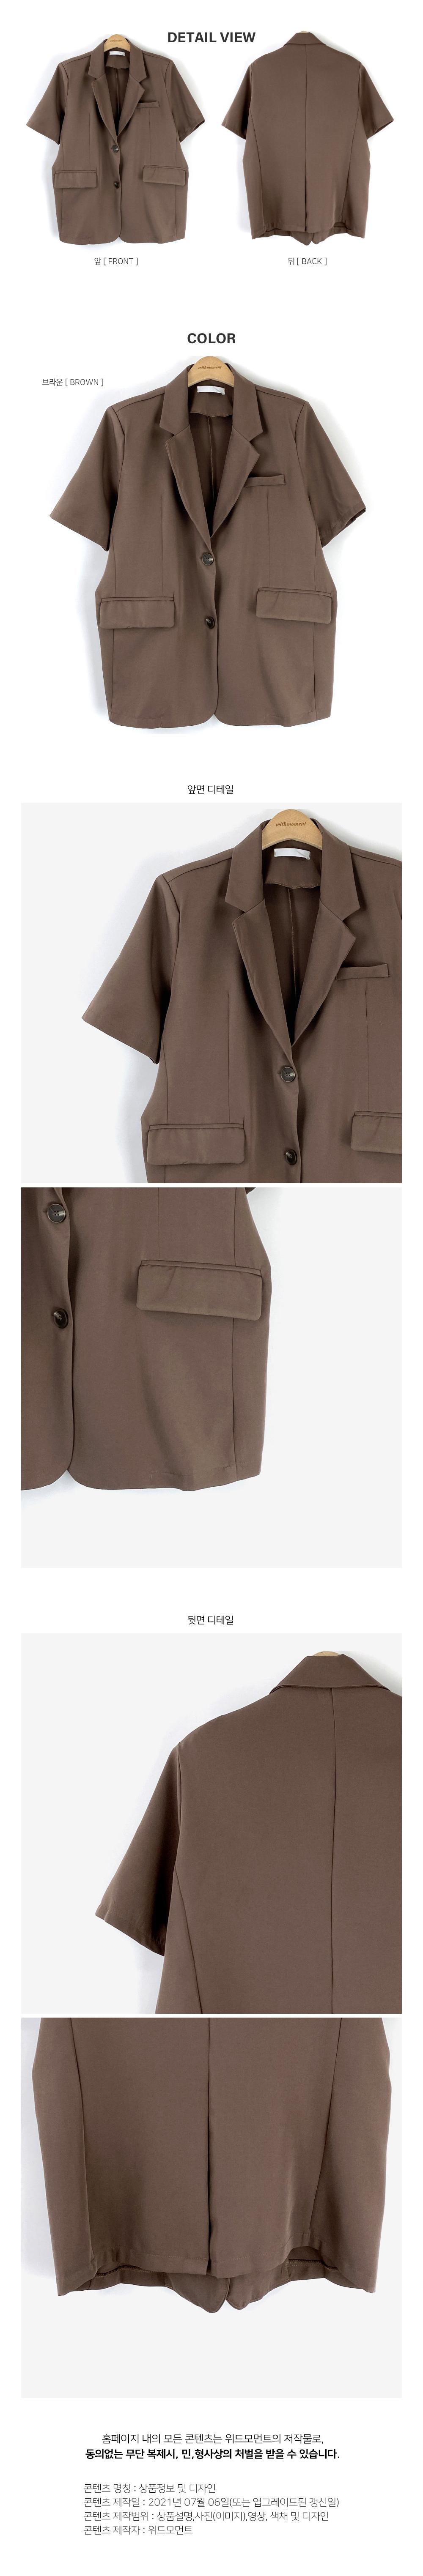 Diona Jacket